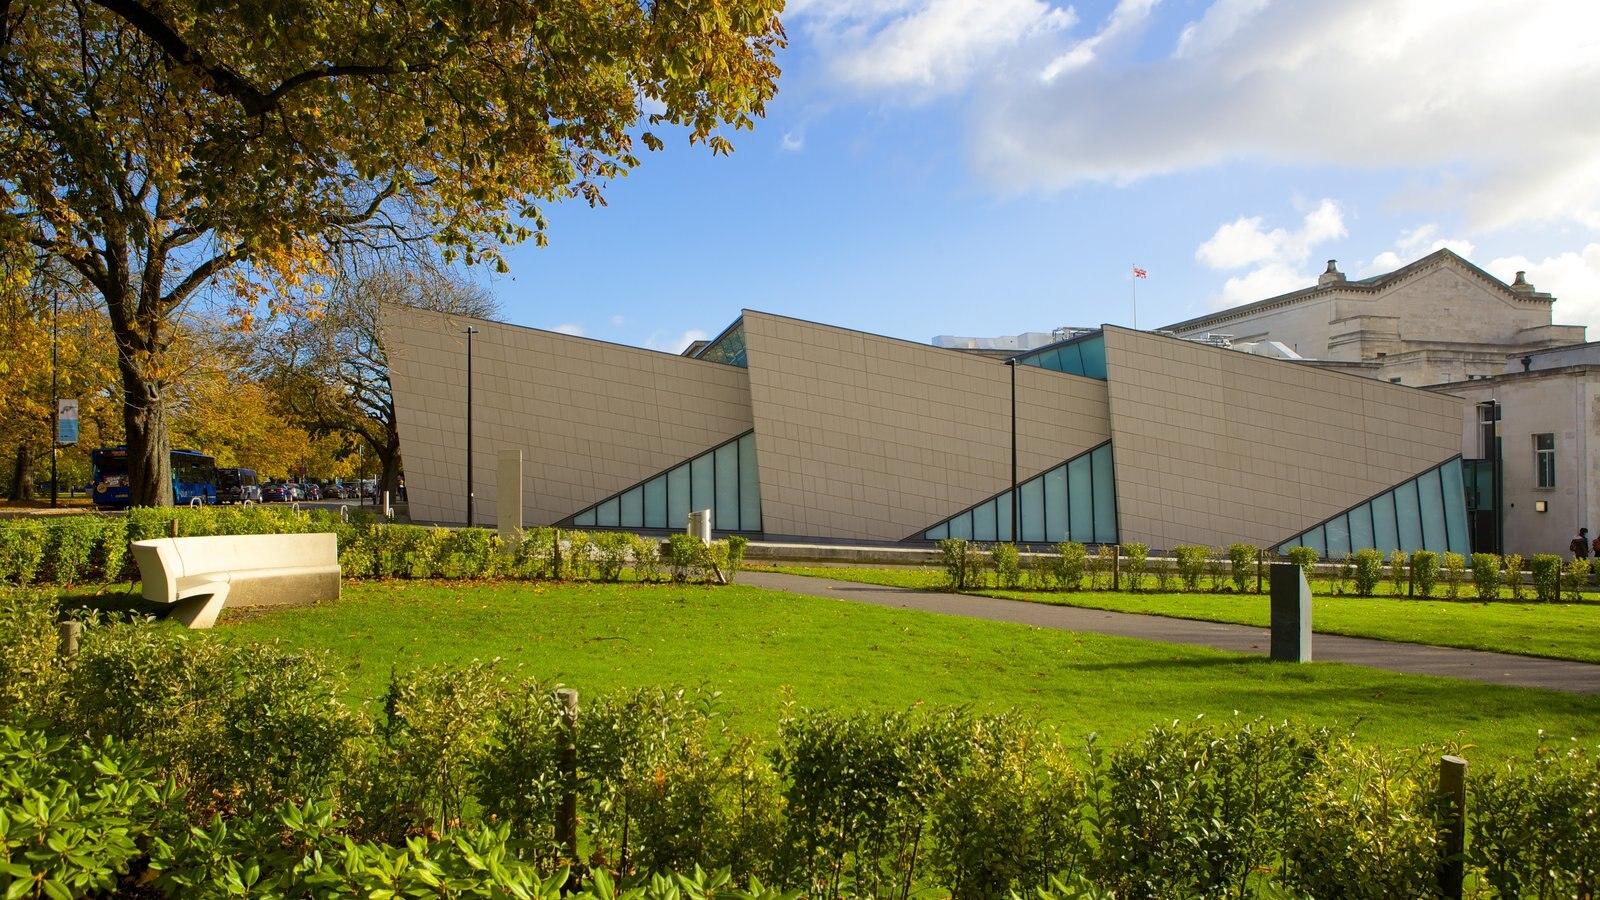 Museo SeaCity mostrando arquitectura moderna